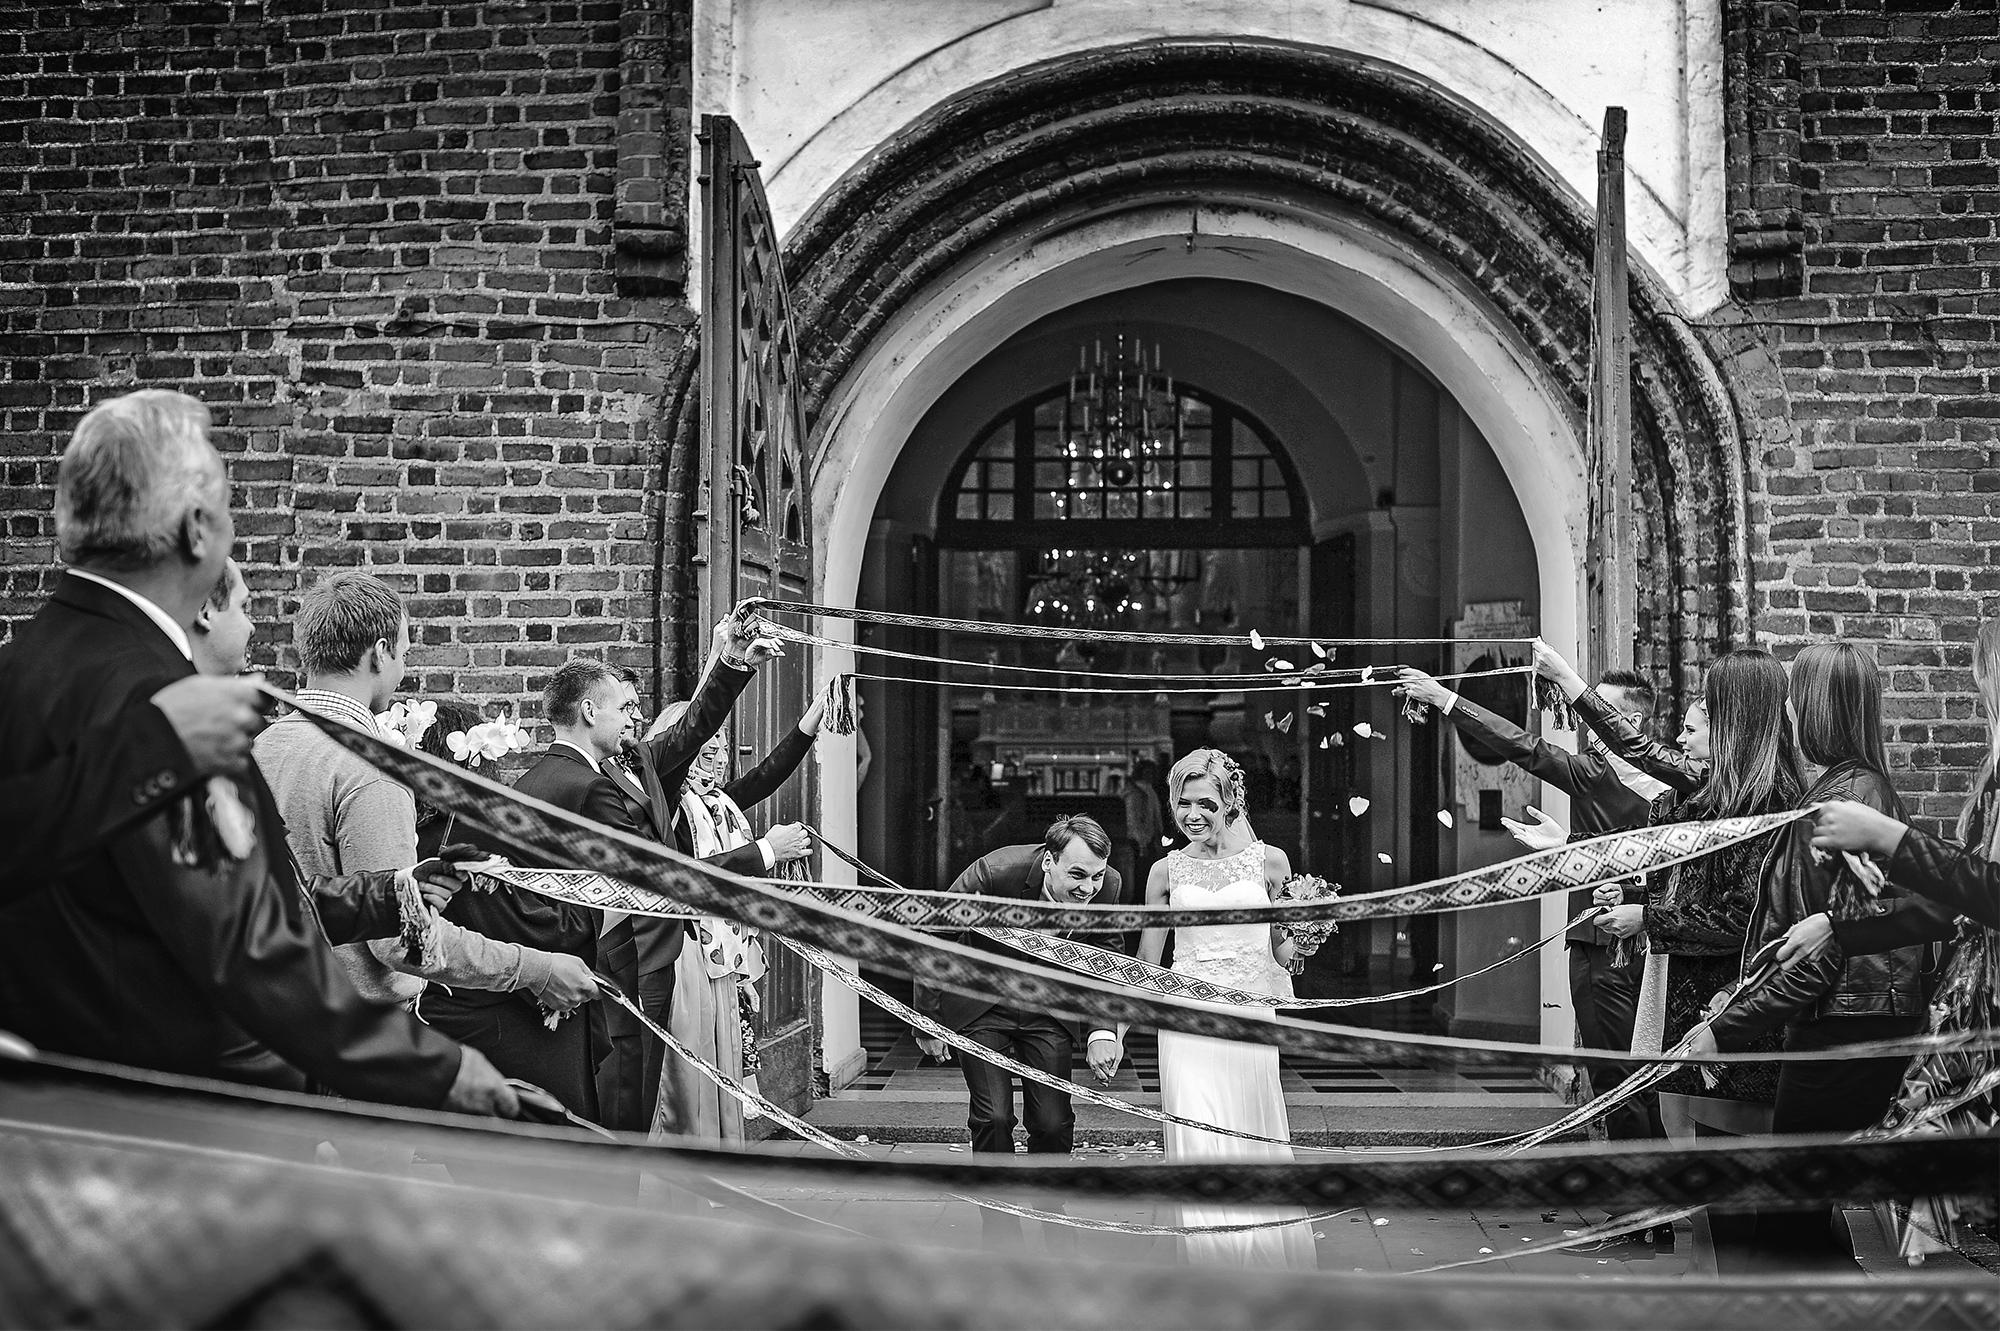 lietuviu tradicines vestuves